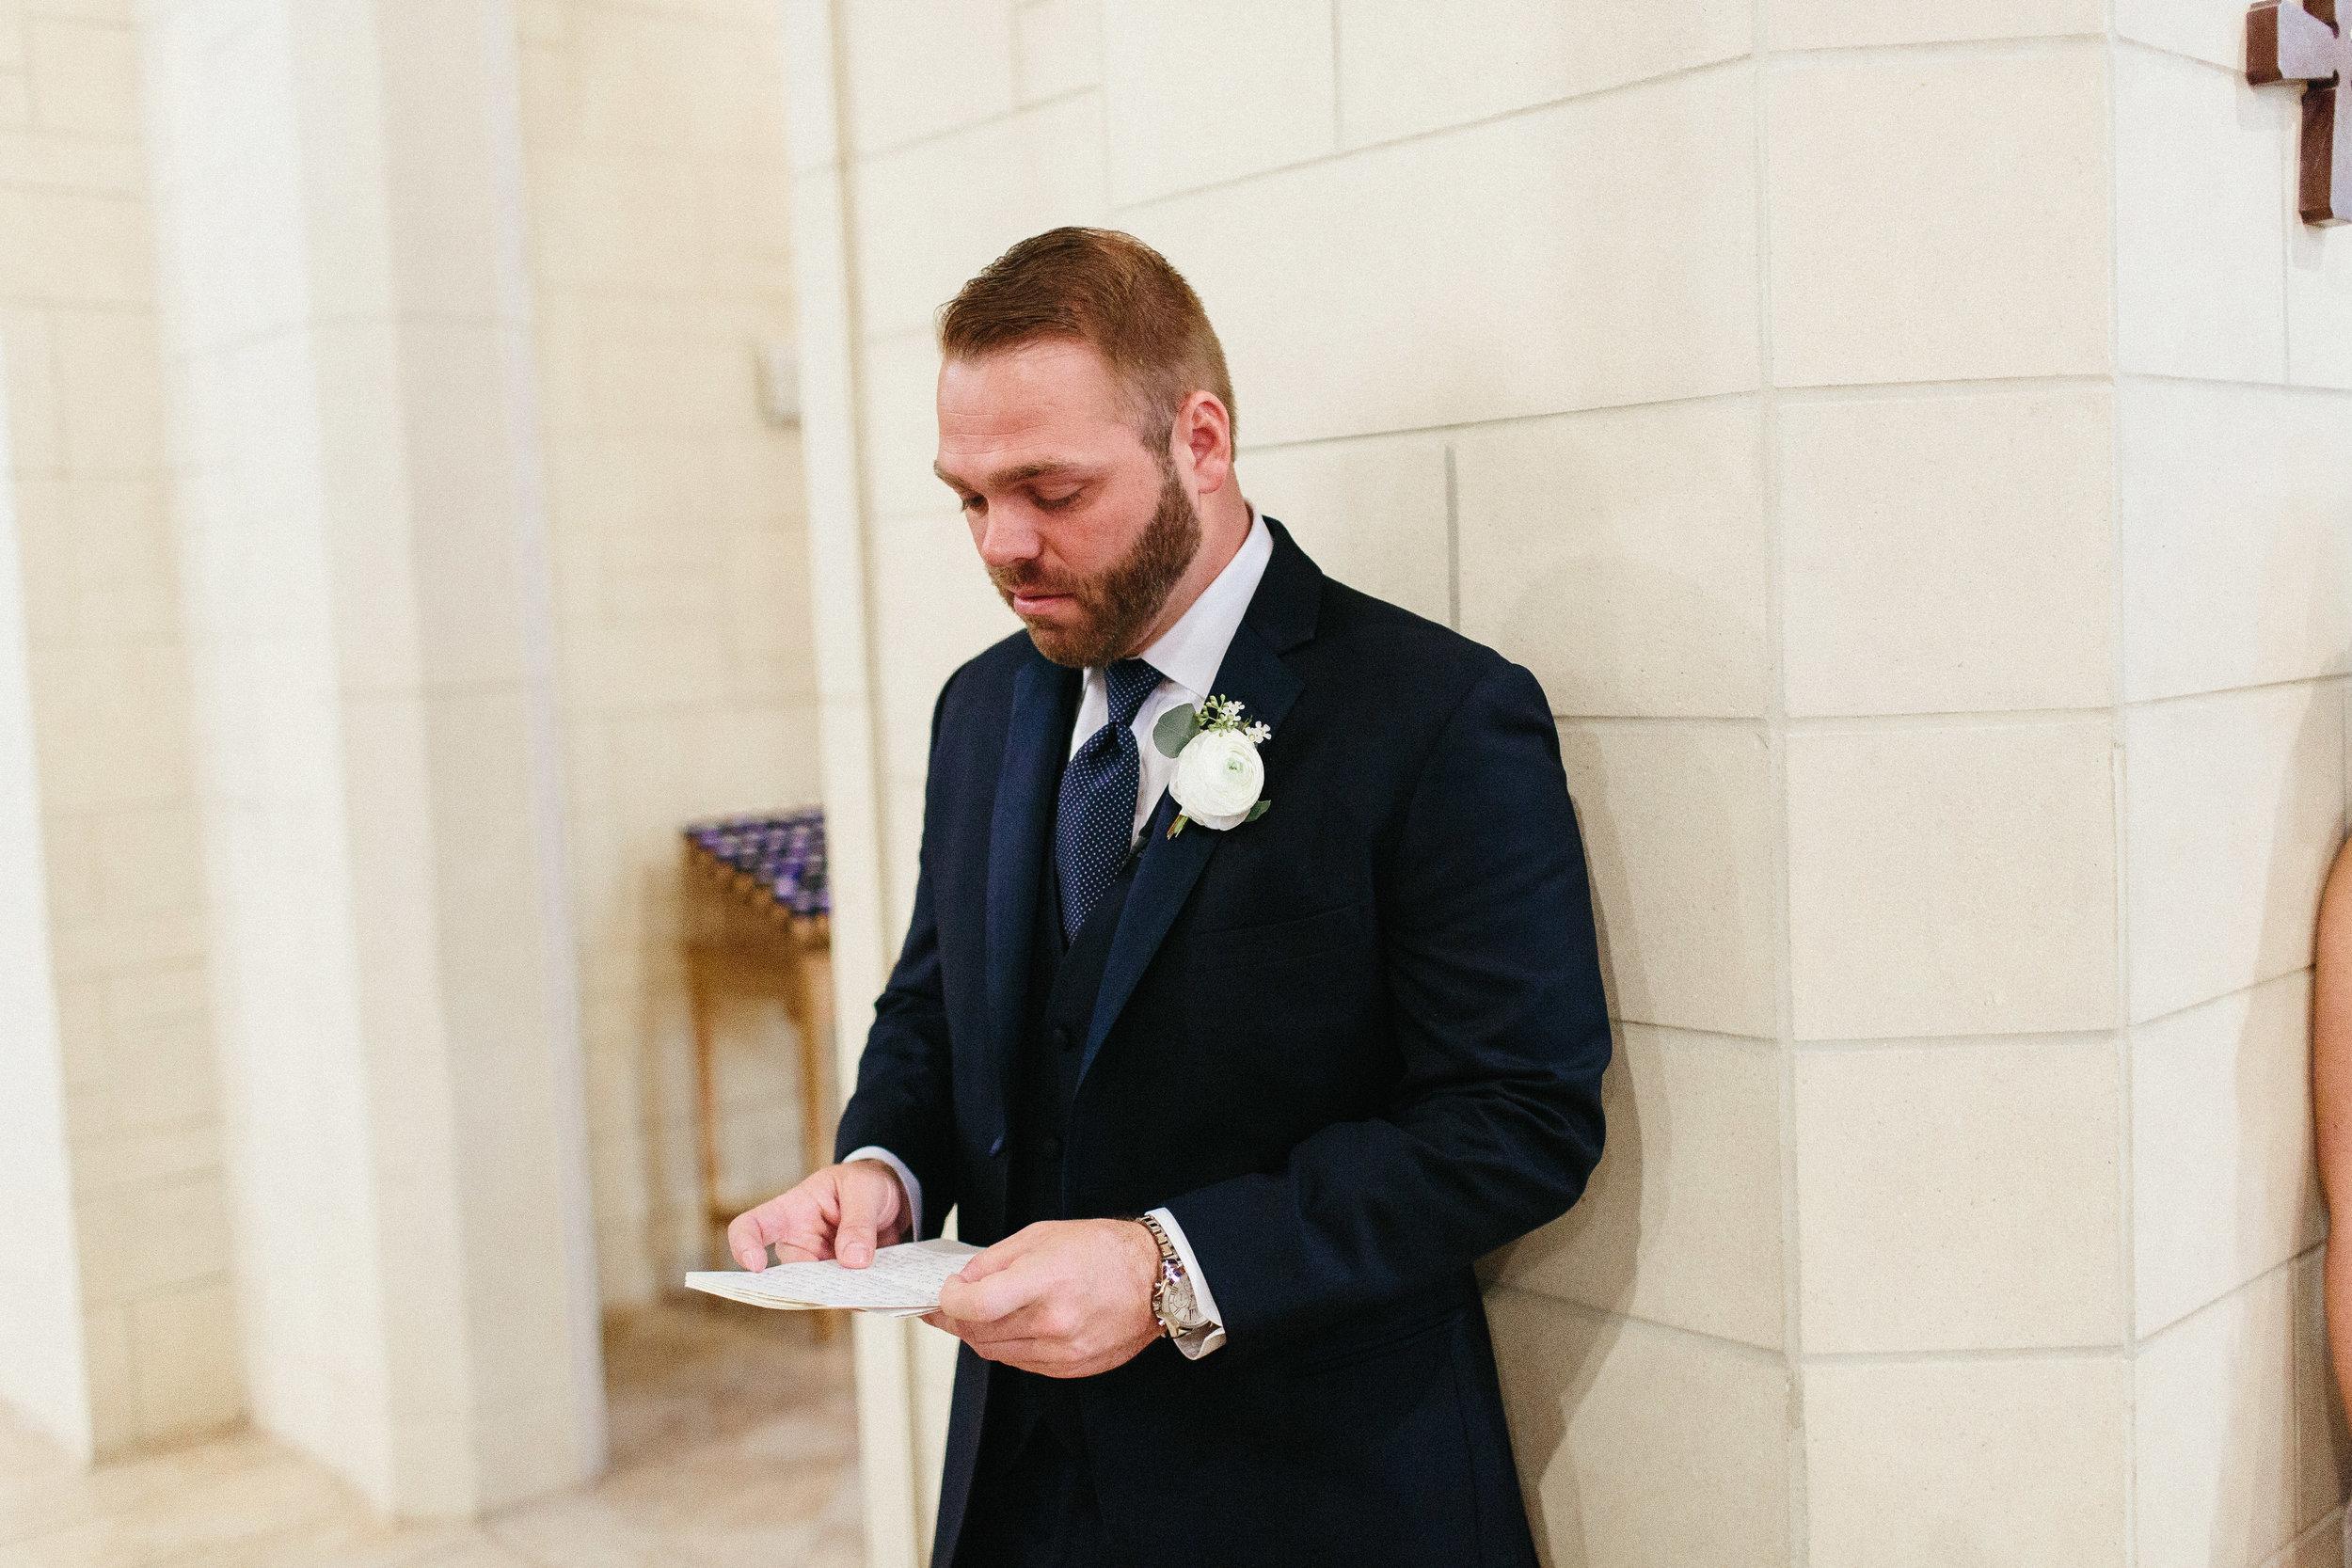 roswell_st_peter_chanel_catholic_avalon_hotel_alpharetta_wedding-1220.jpg